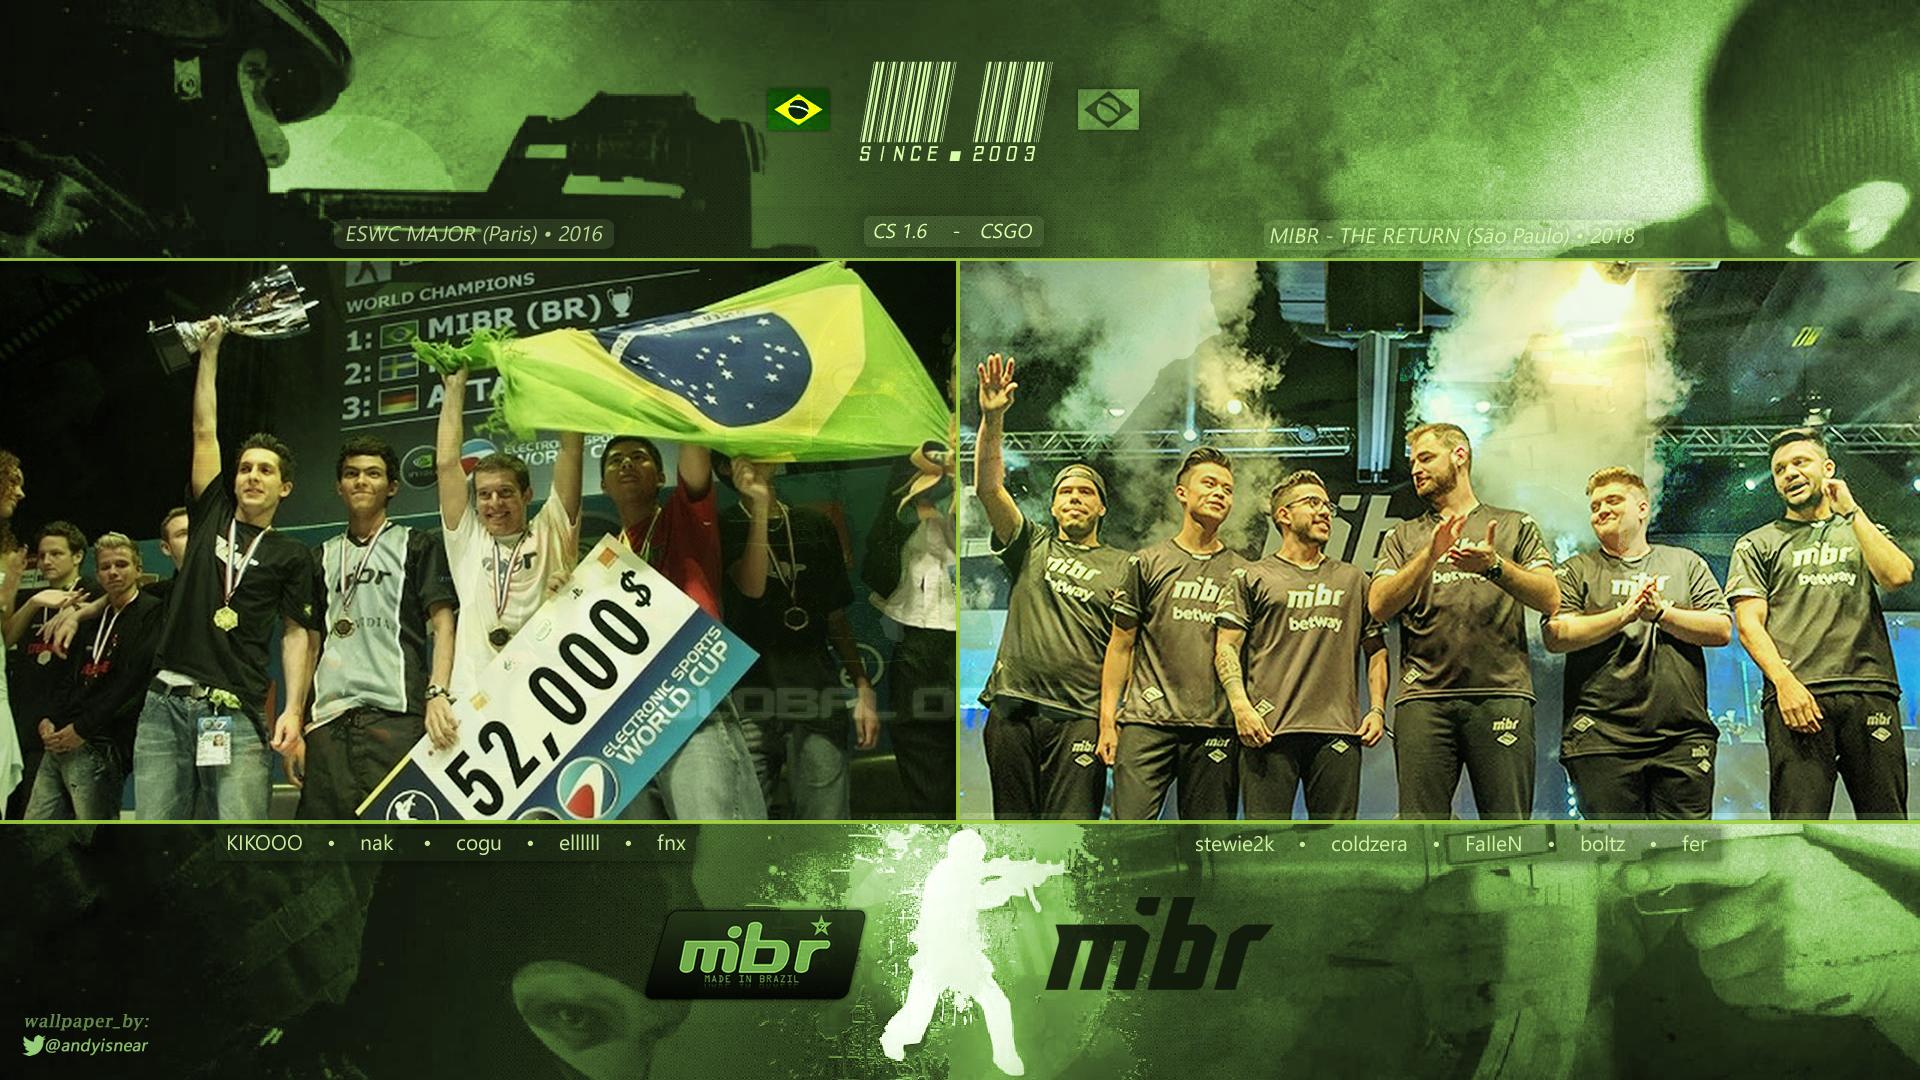 MIBR - The Return